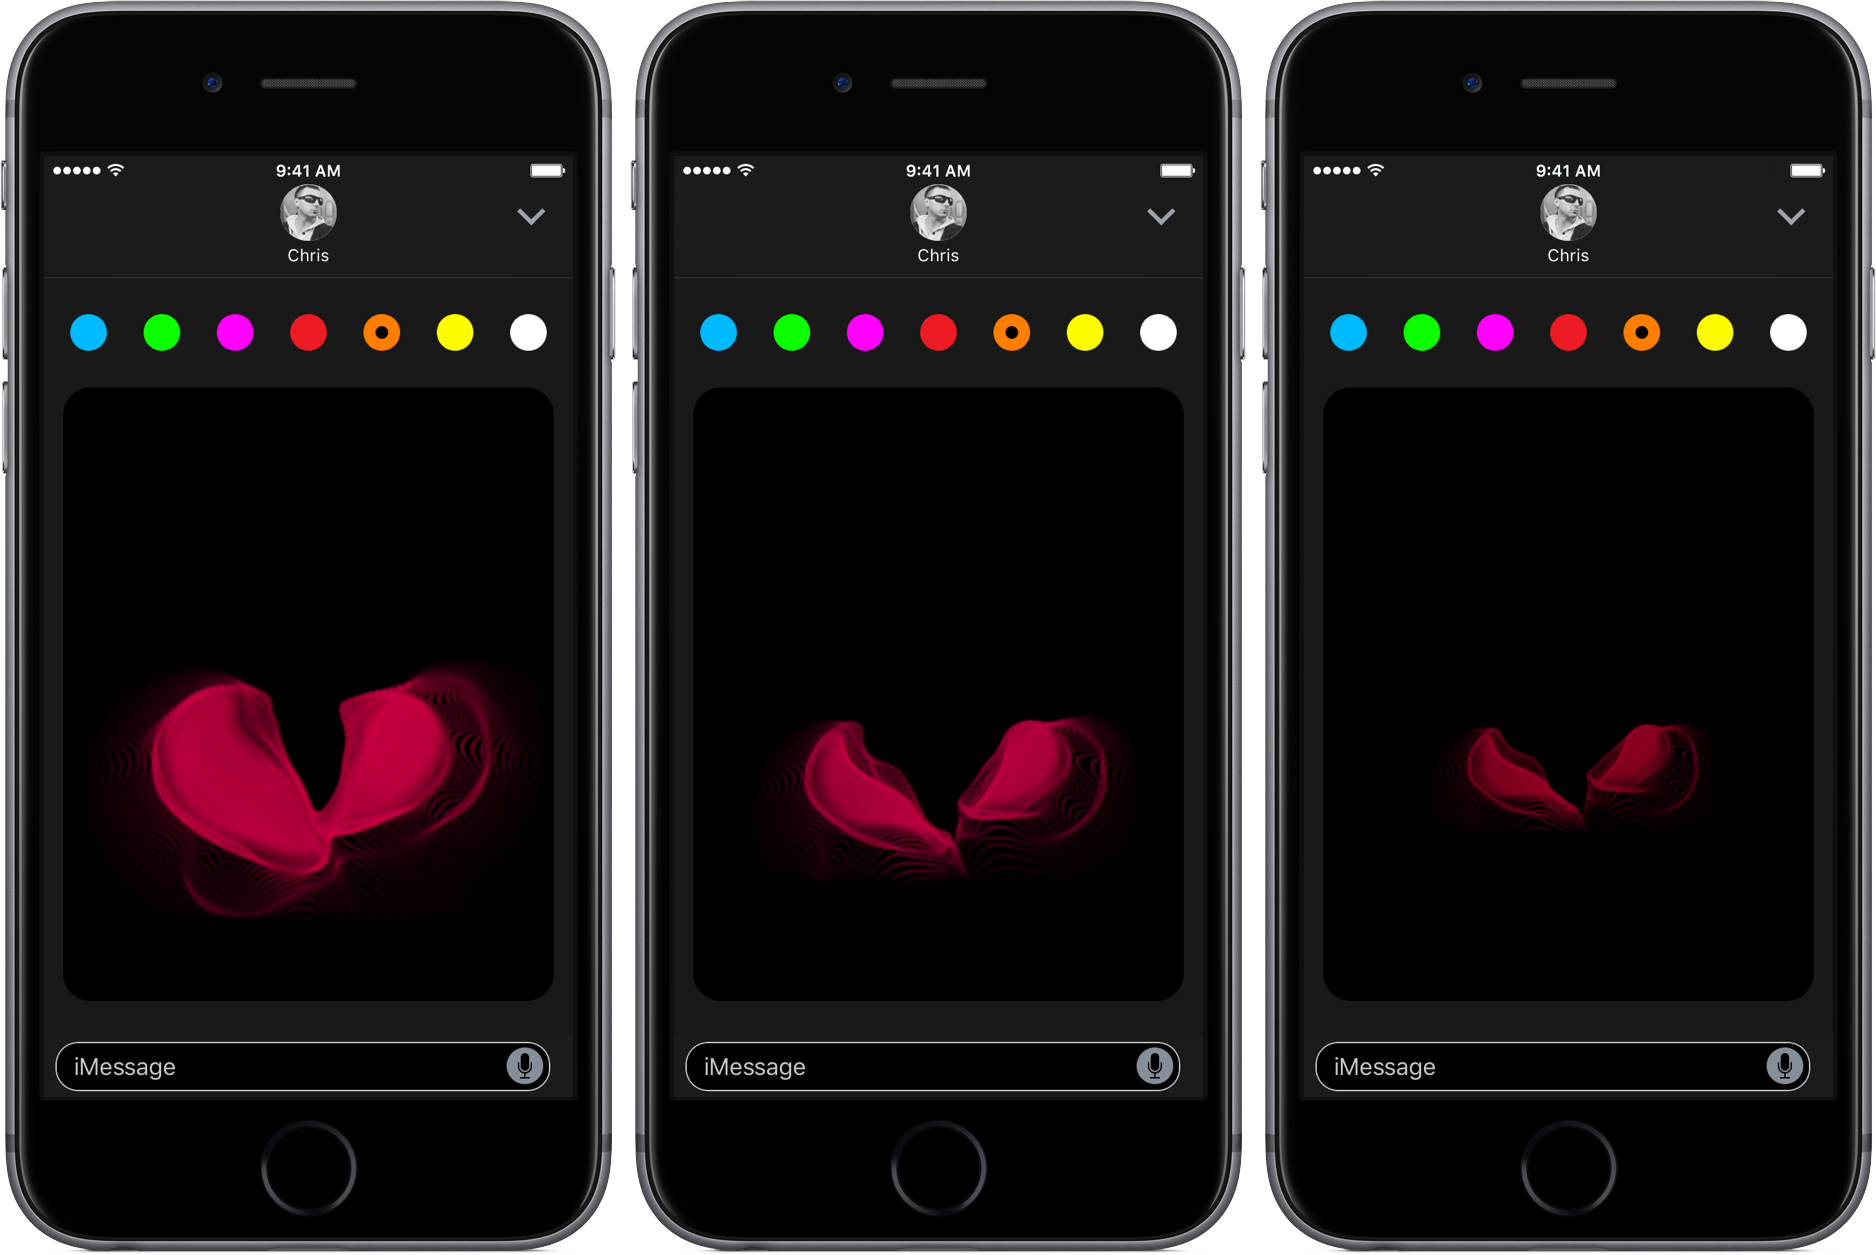 iOS 10 tidbit: sending broken hearts via iMessage